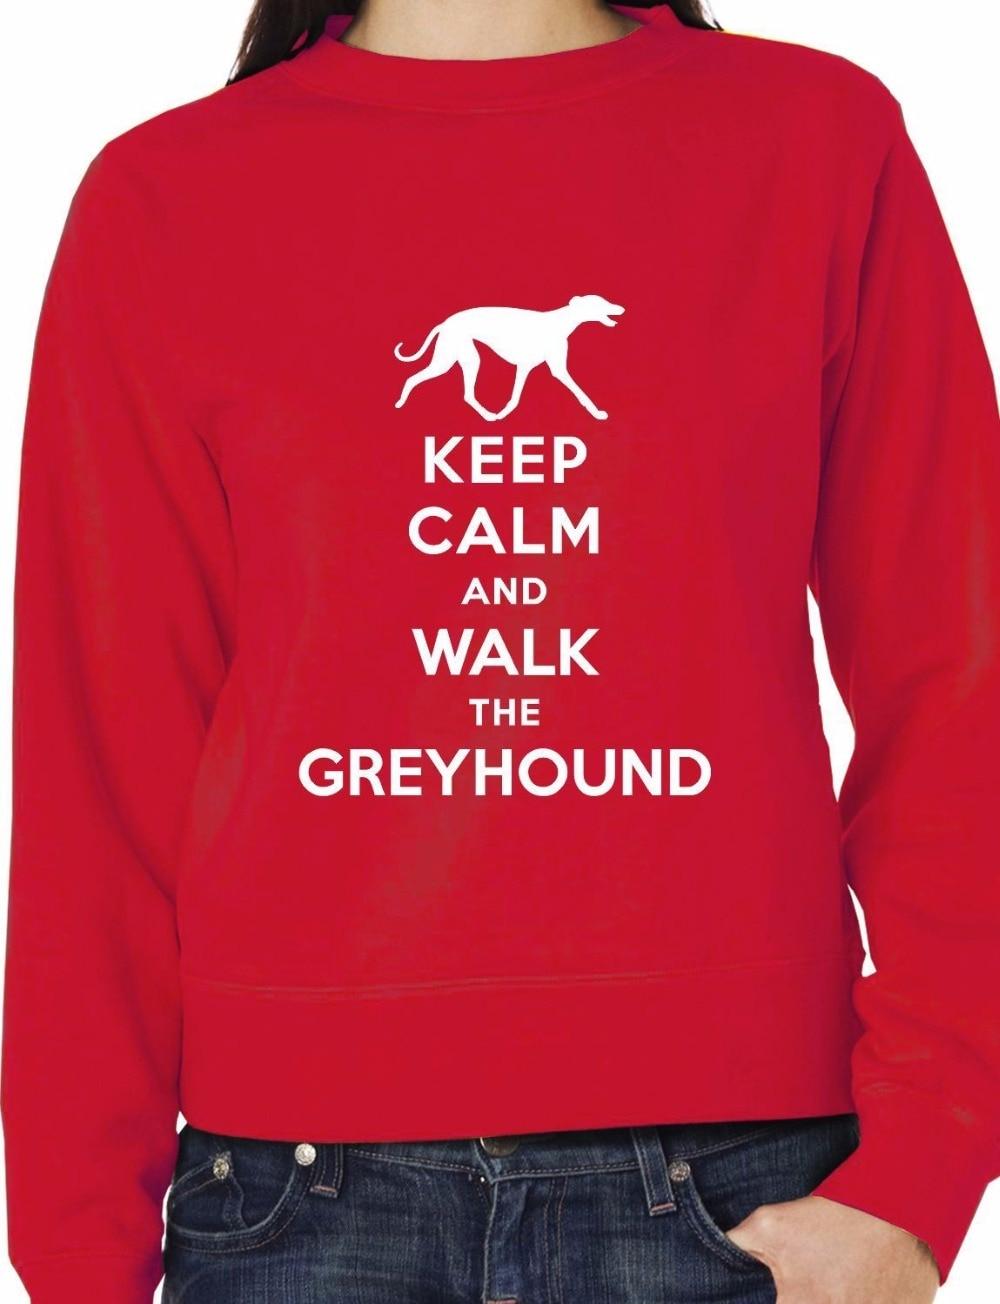 Keep Calm Walk Greyhound Dog Lovers Sweatshirt More Size and Colors-E109